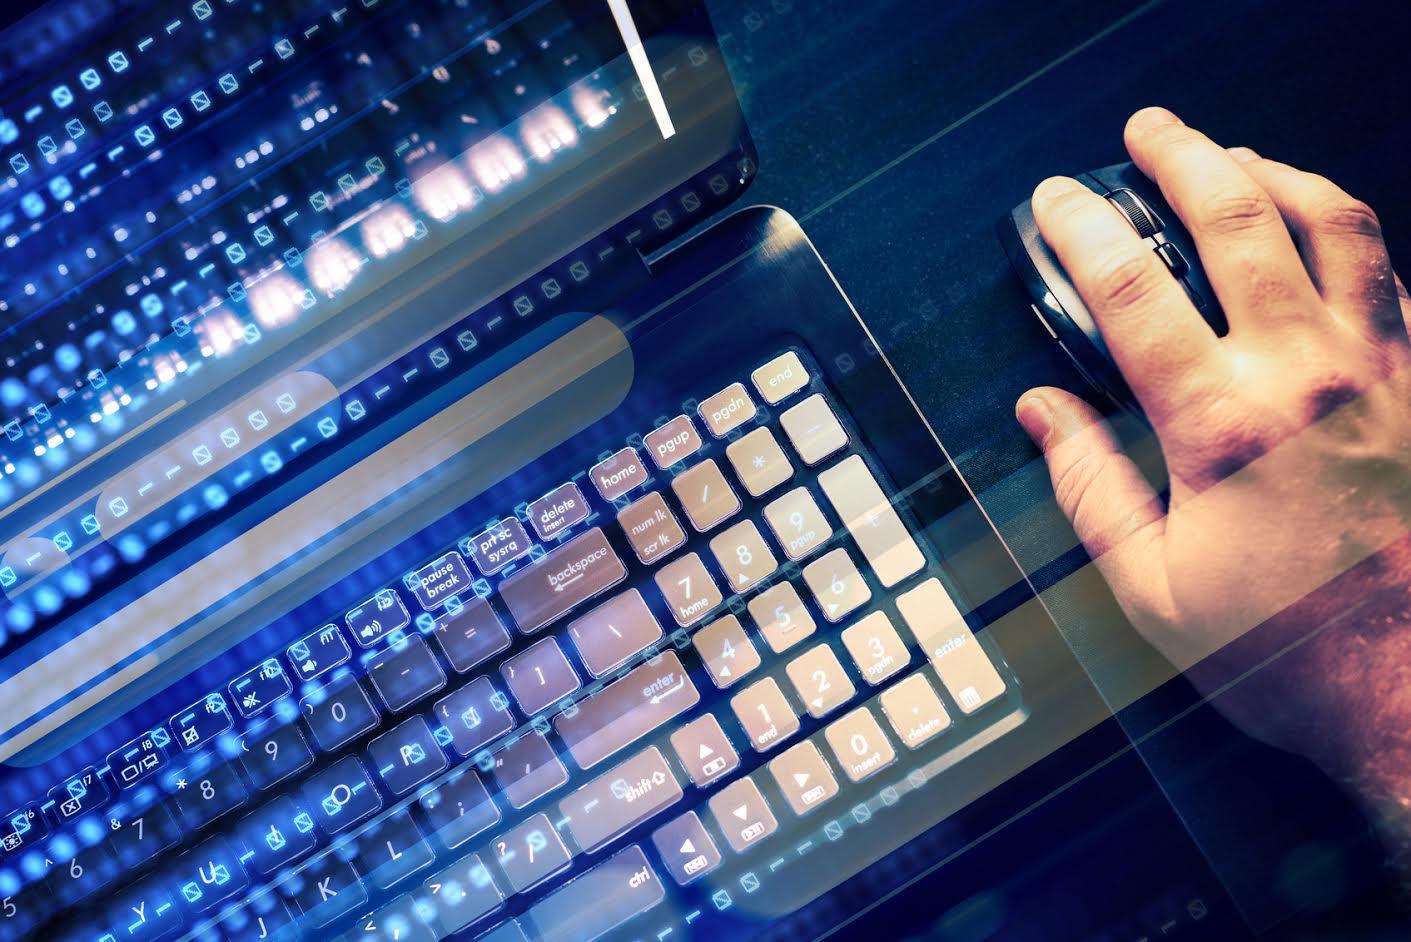 Shamoon 2.0 malware rears its head again with renewed attacks on Saudi Arabia organisations